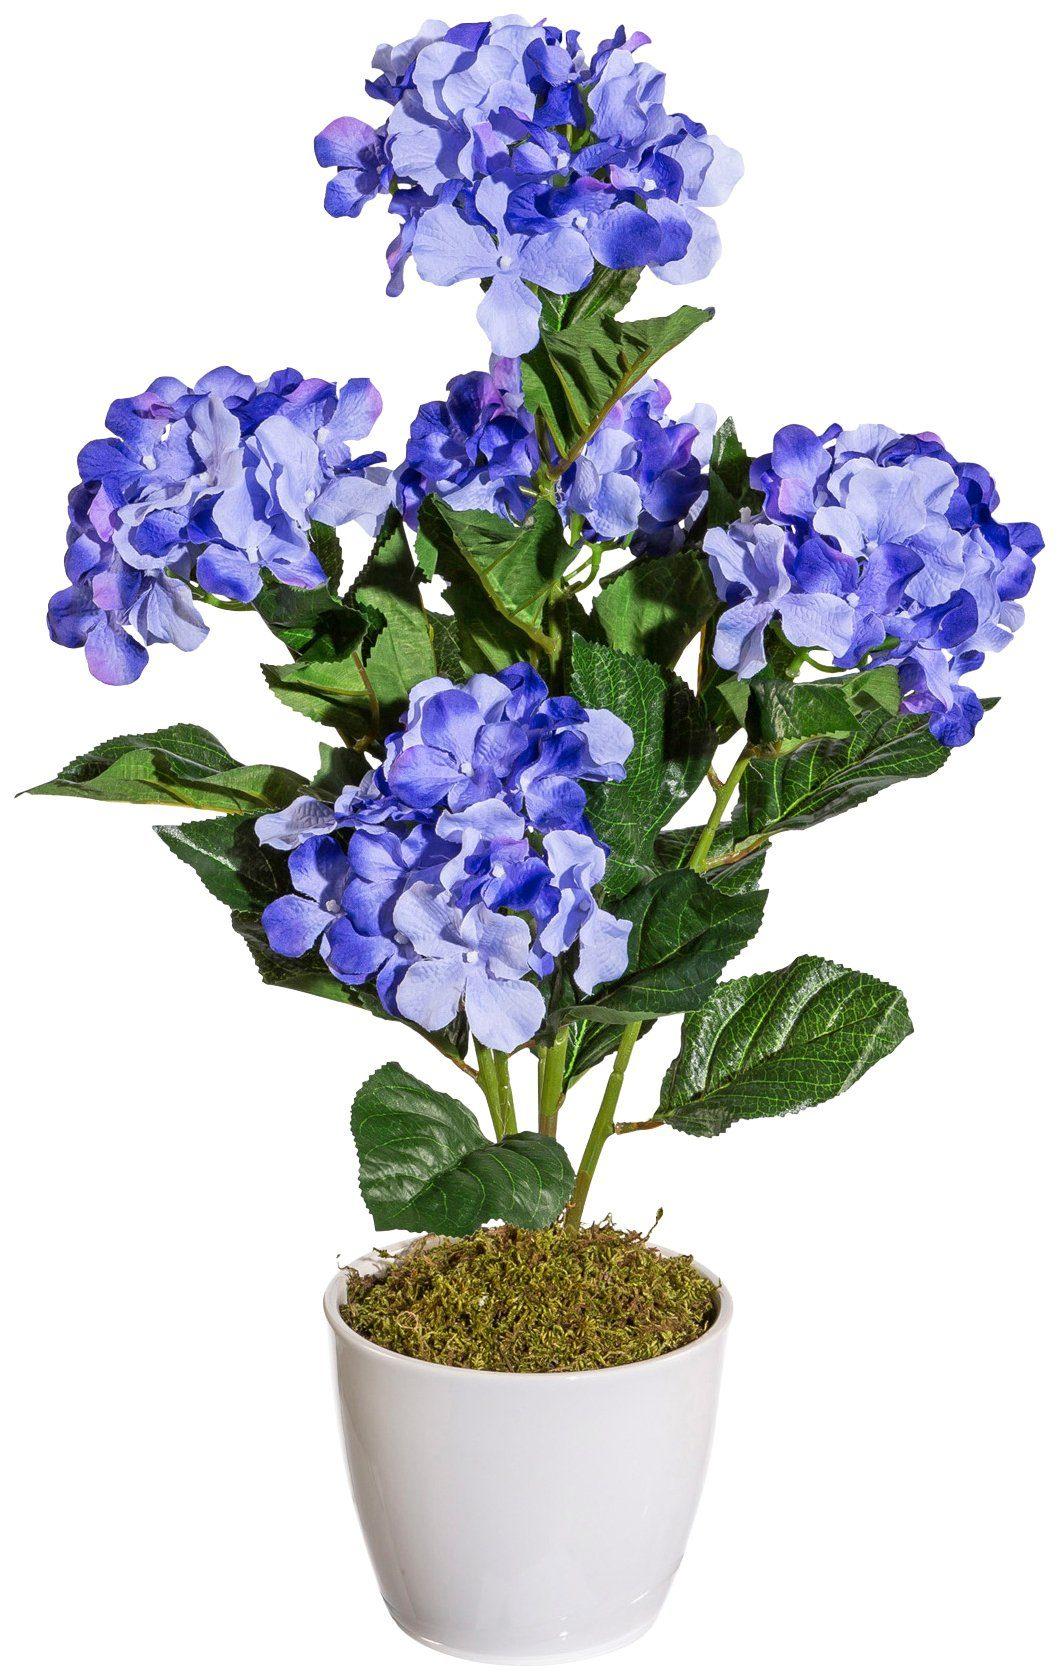 Kunstpflanze »Hortensie«, im Keramiktopf, Höhe 50 cm, blau